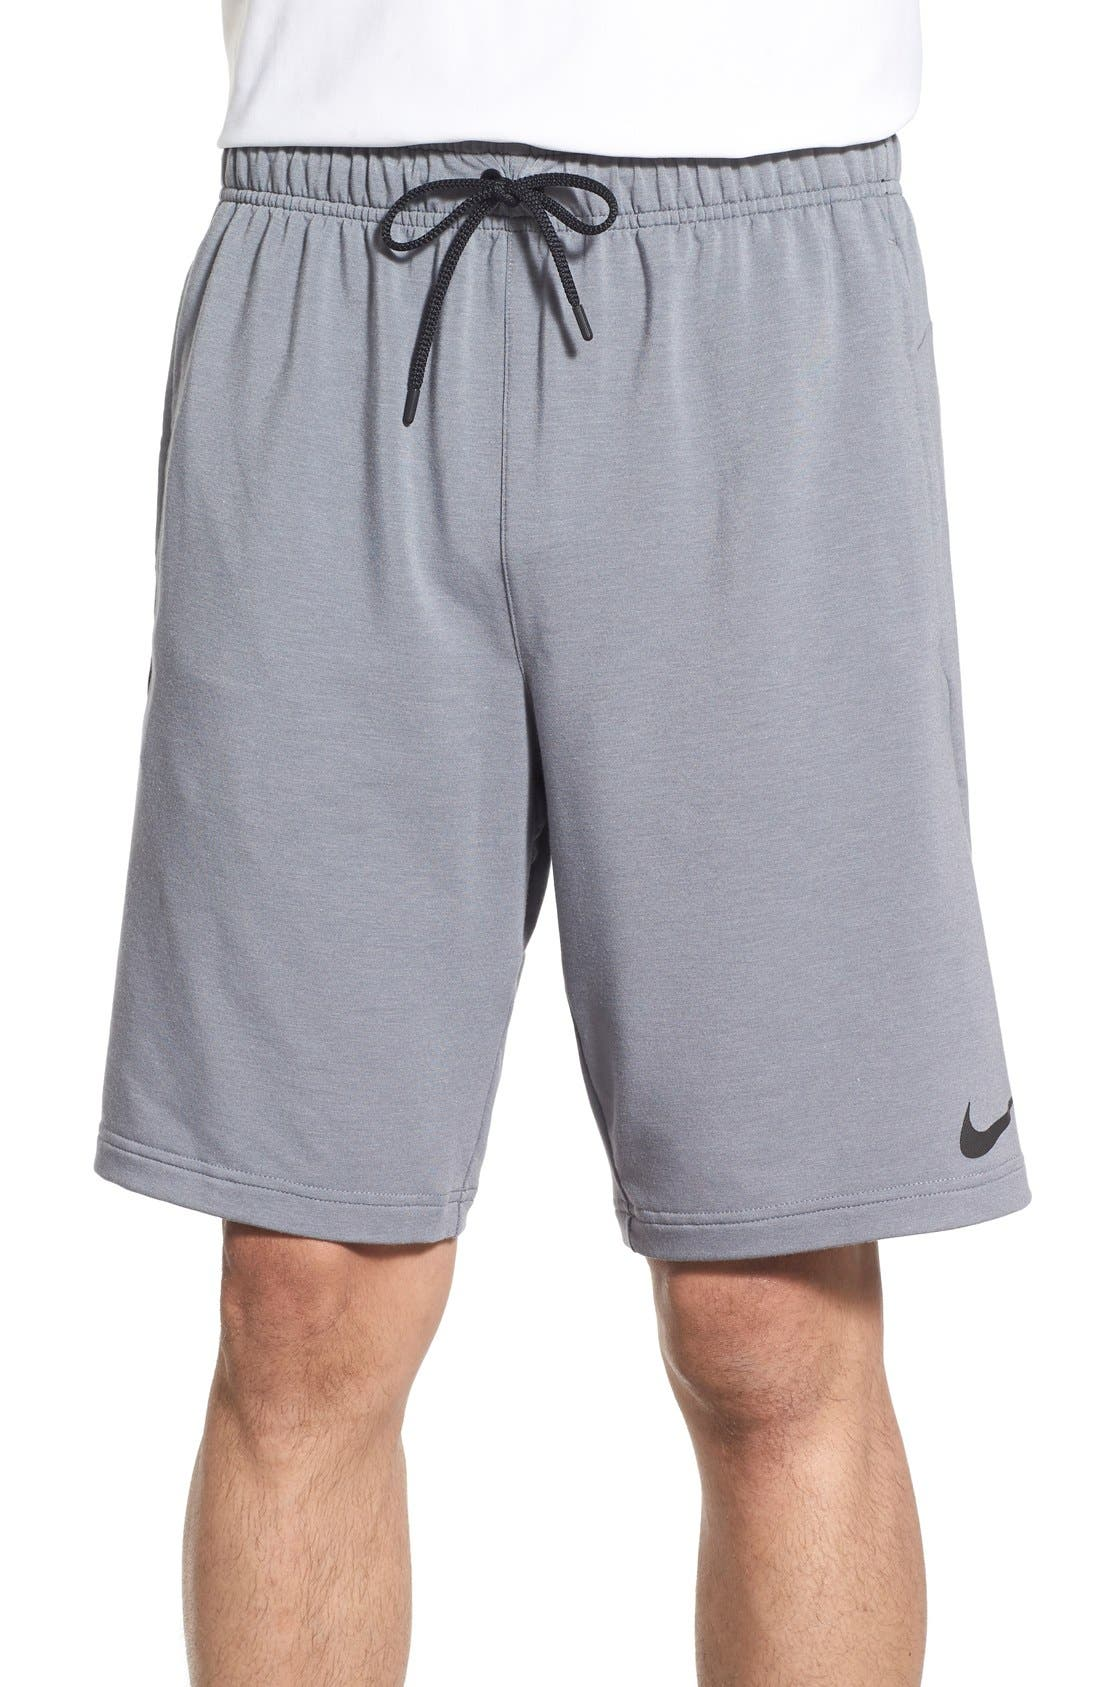 Nike Dri-FIT Fleece Training Shorts